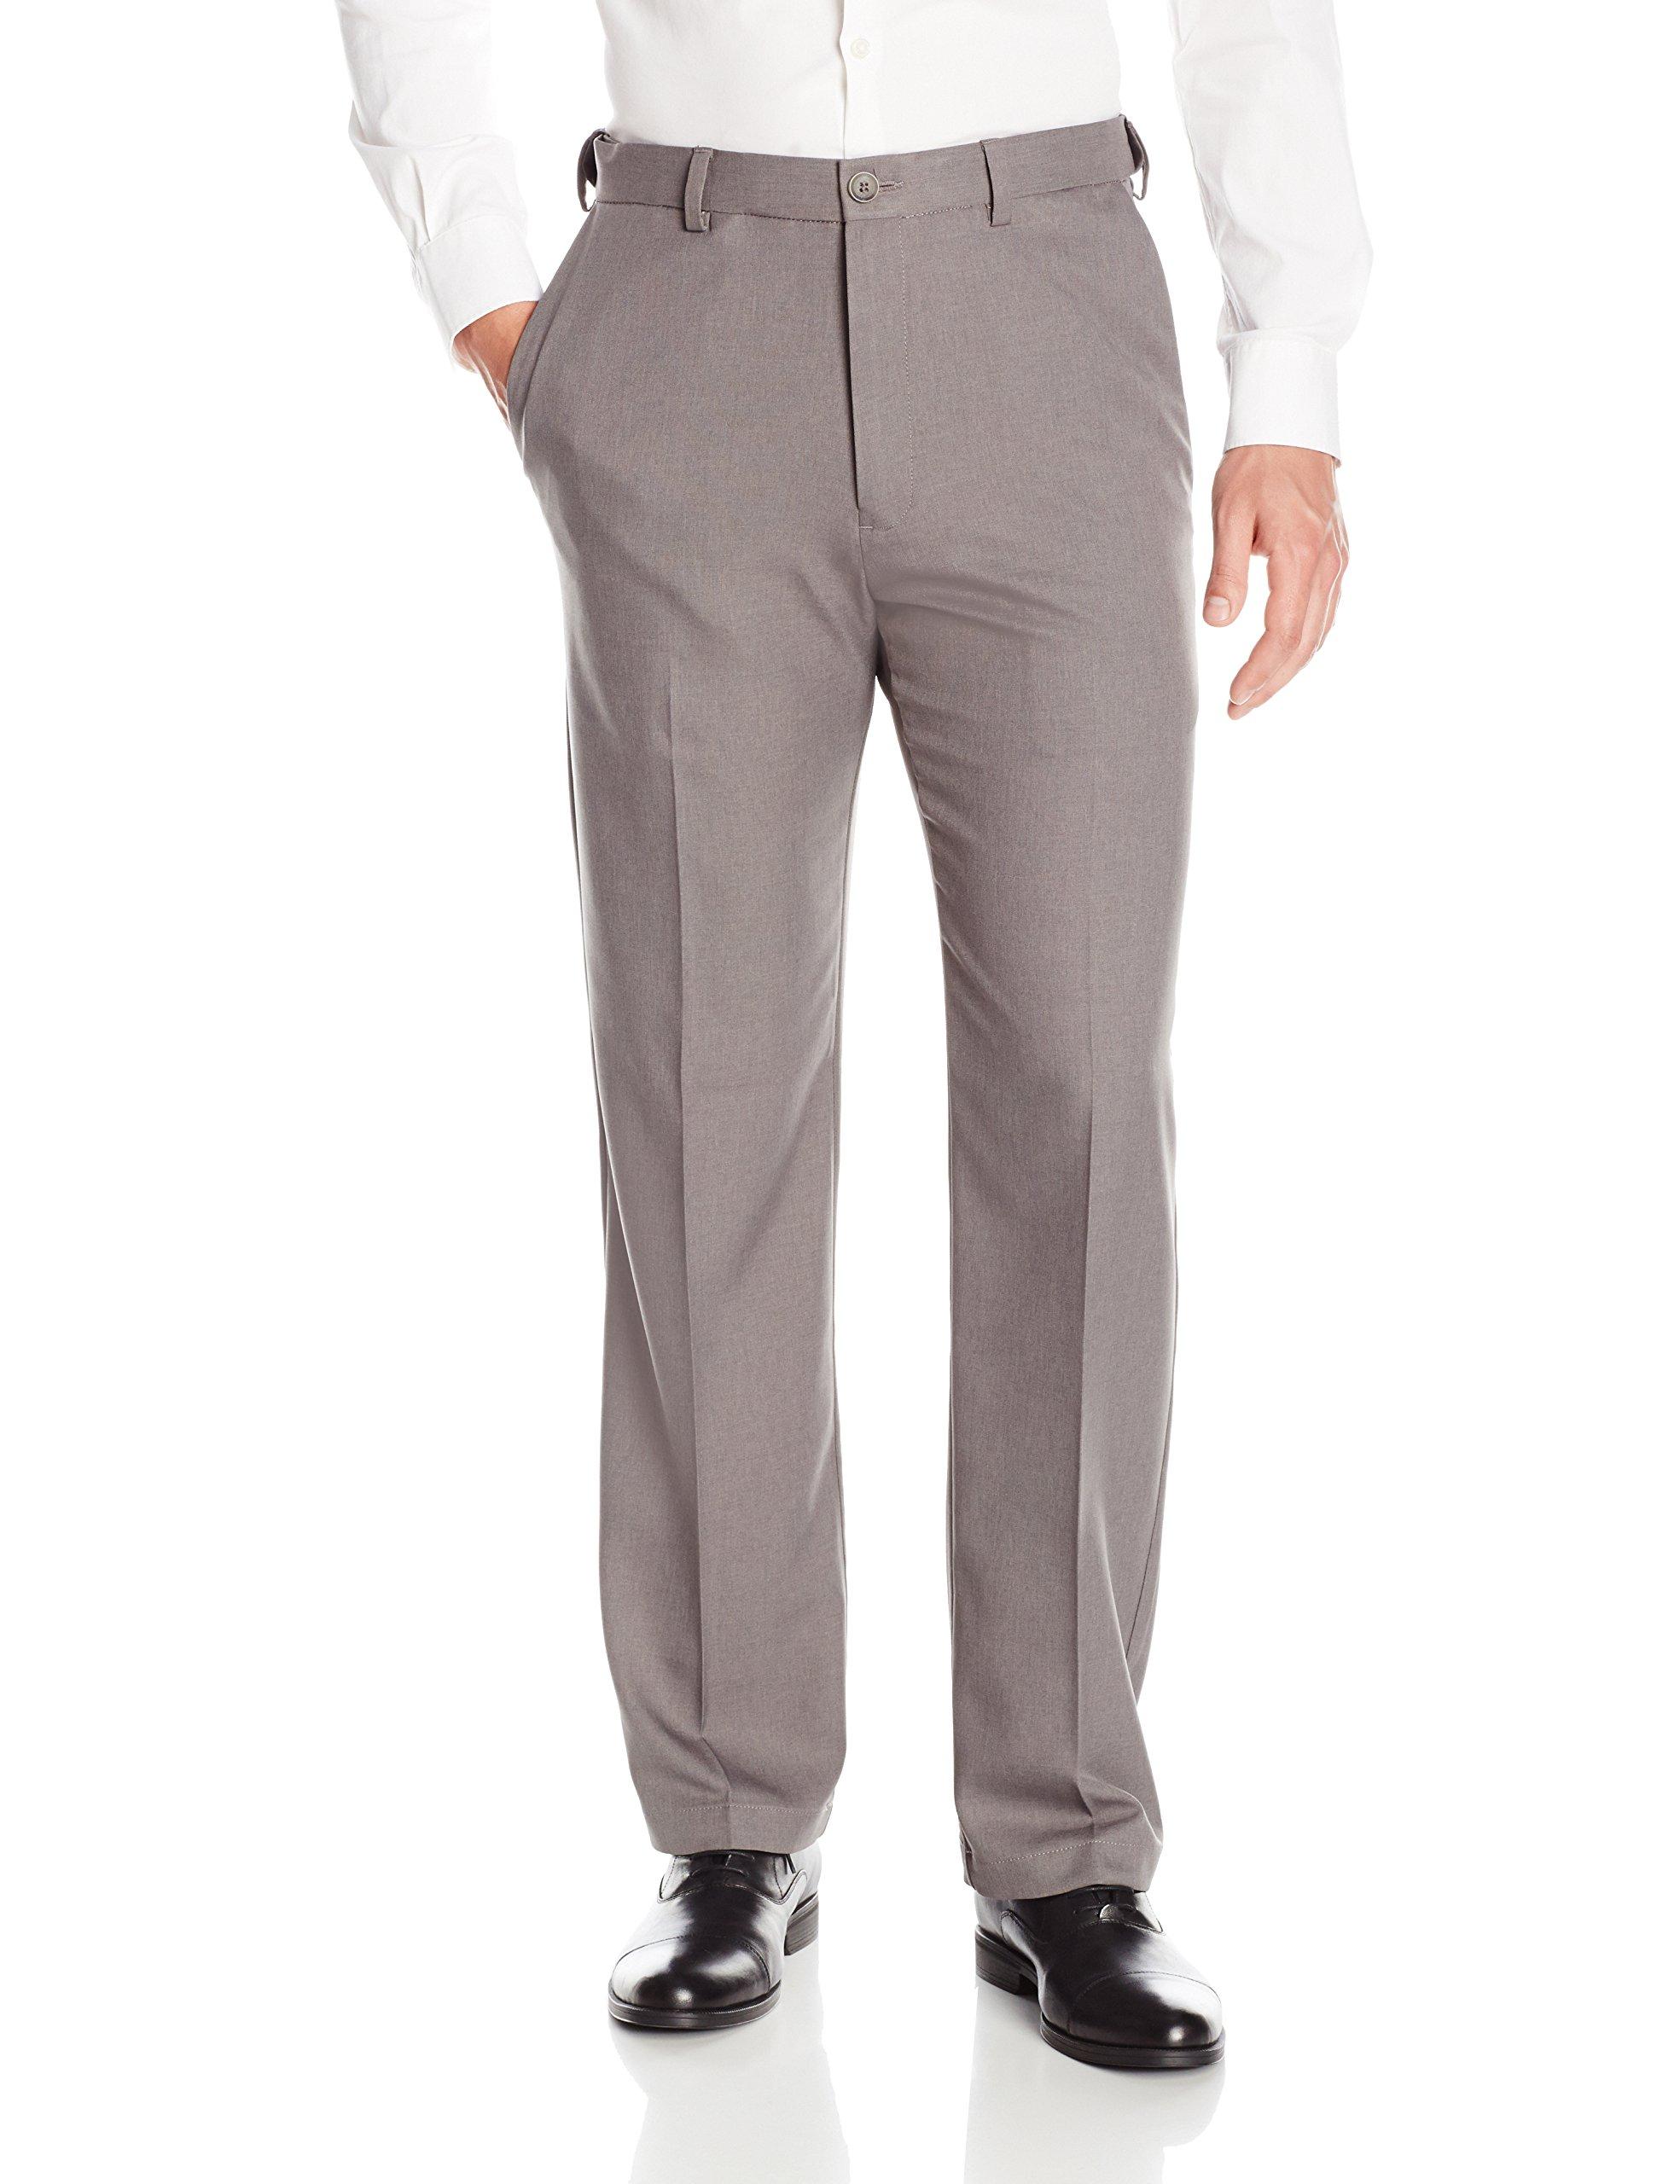 Haggar Men's Cool 18 PRO Classic Fit Flat Front Expandable Waist Pant, Heather Grey, 46Wx34L